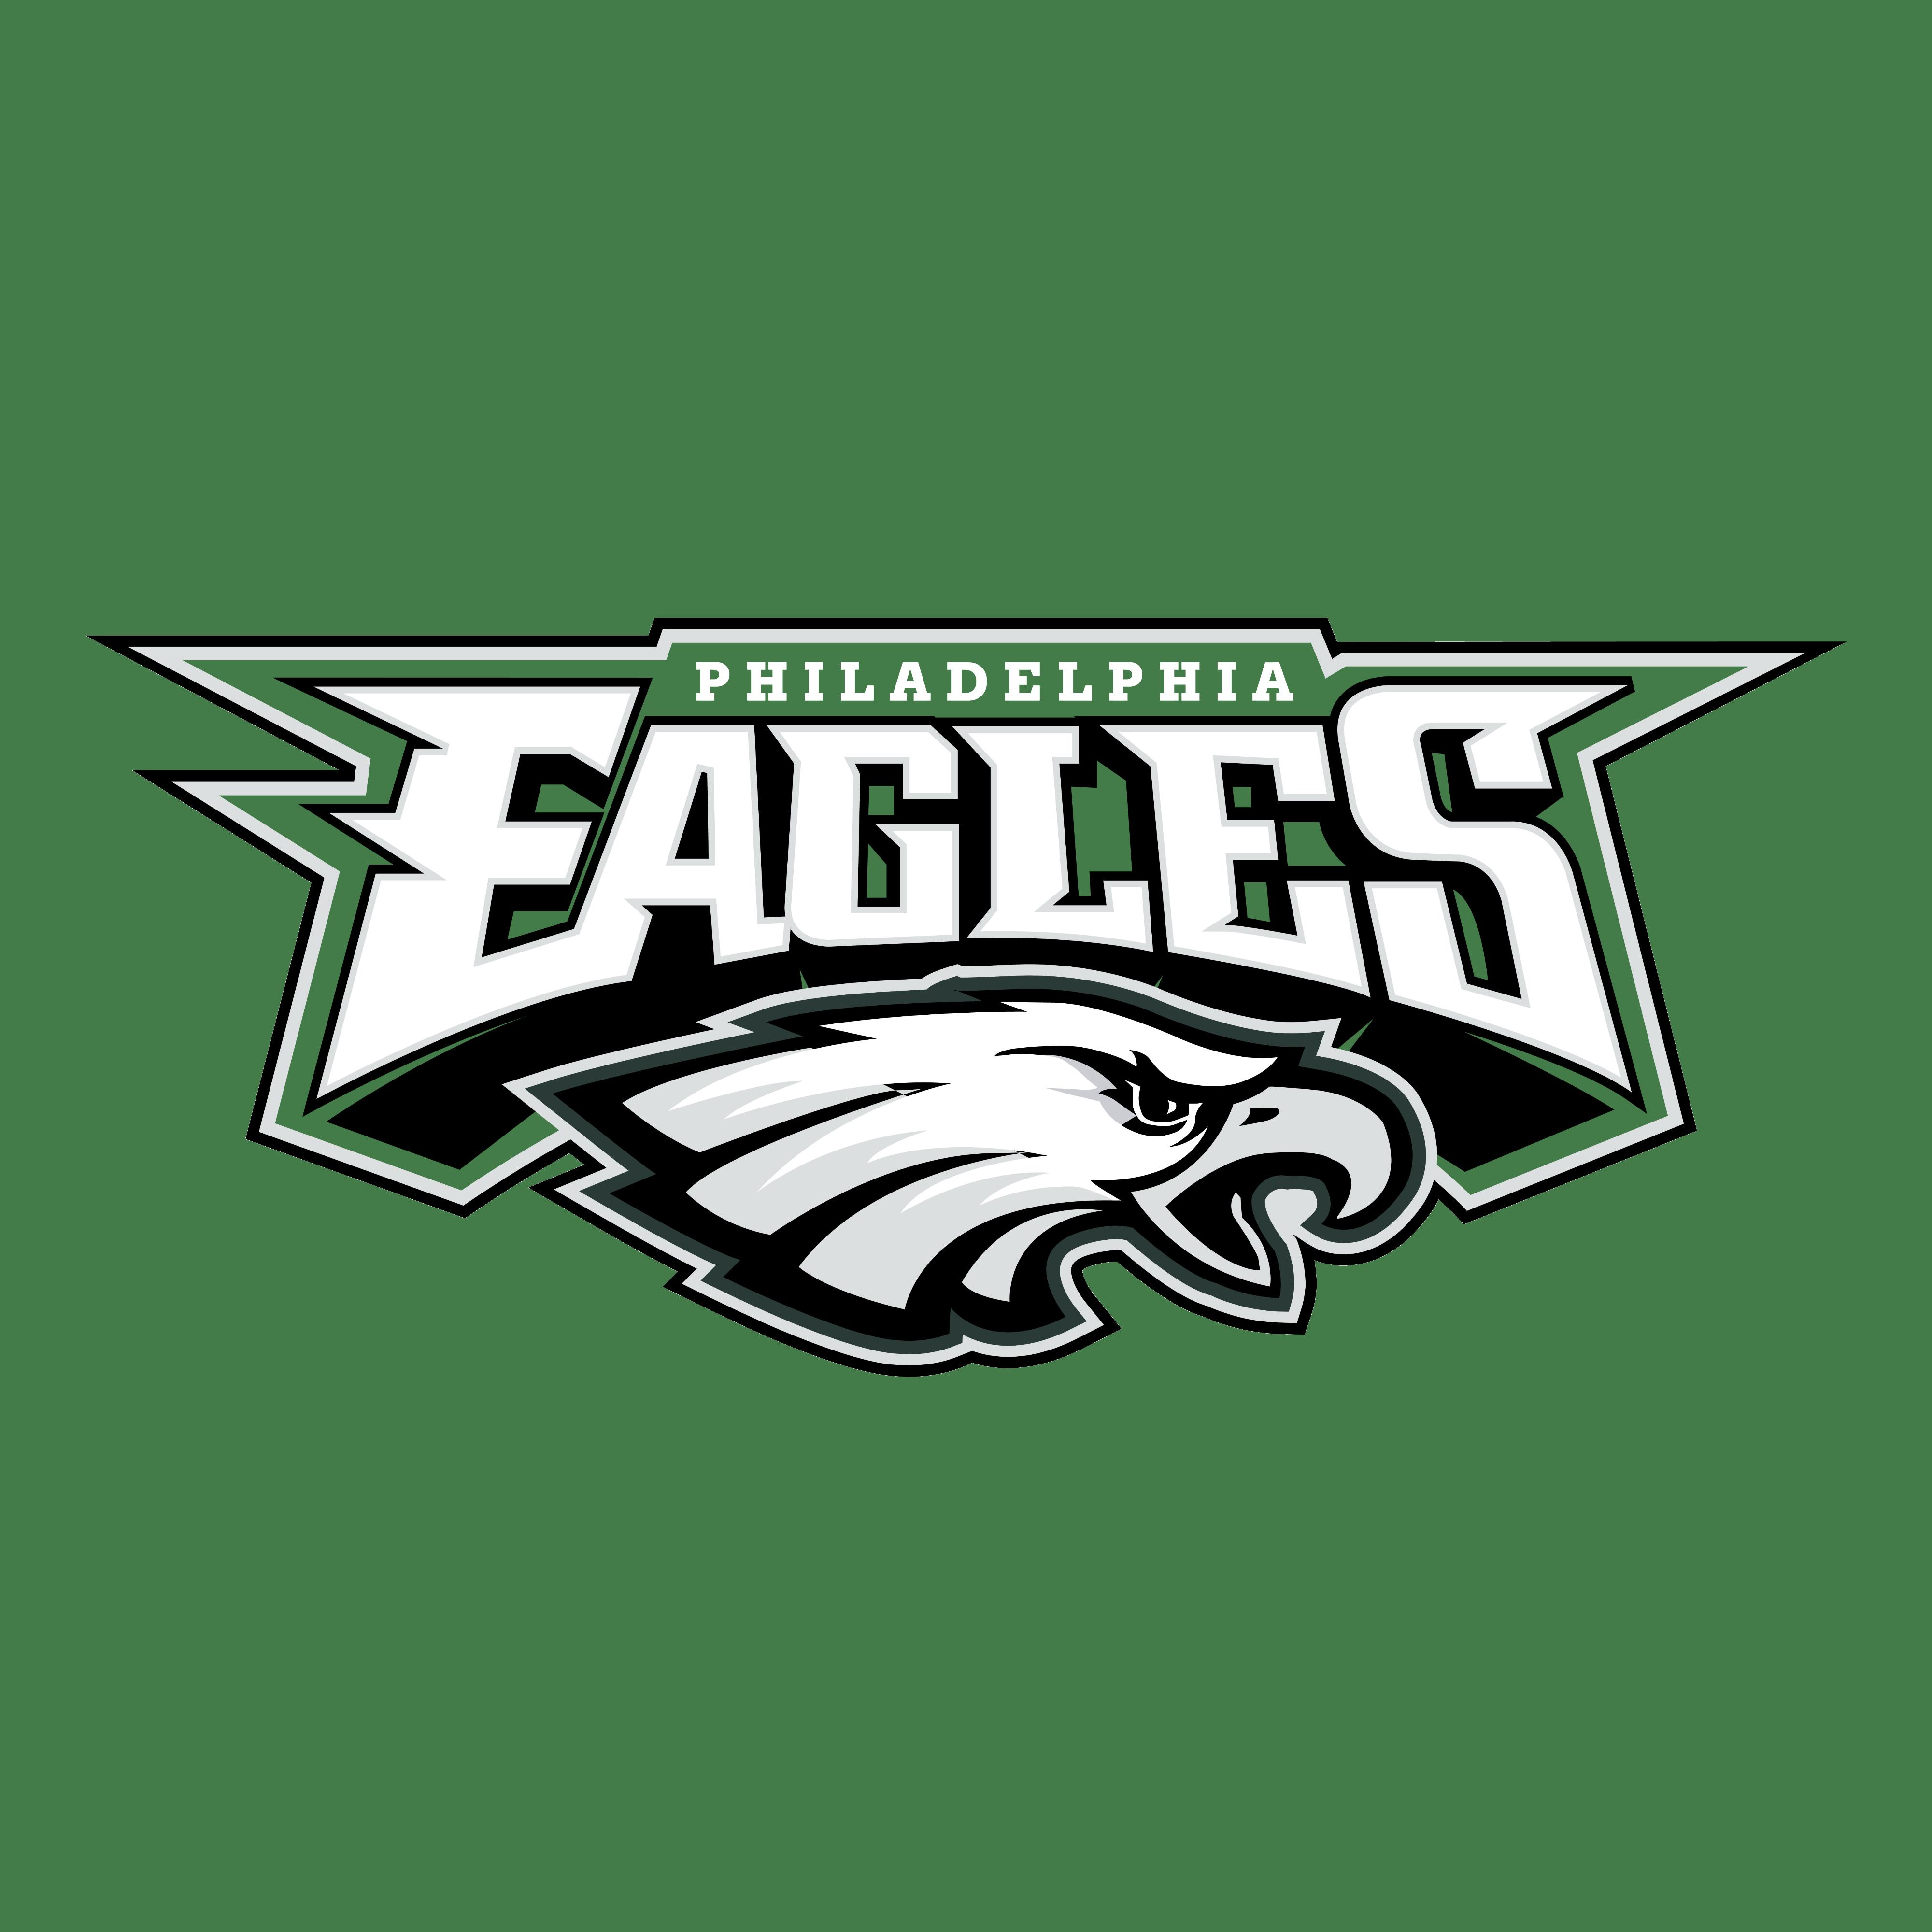 Philadelphia Eagles, NFL